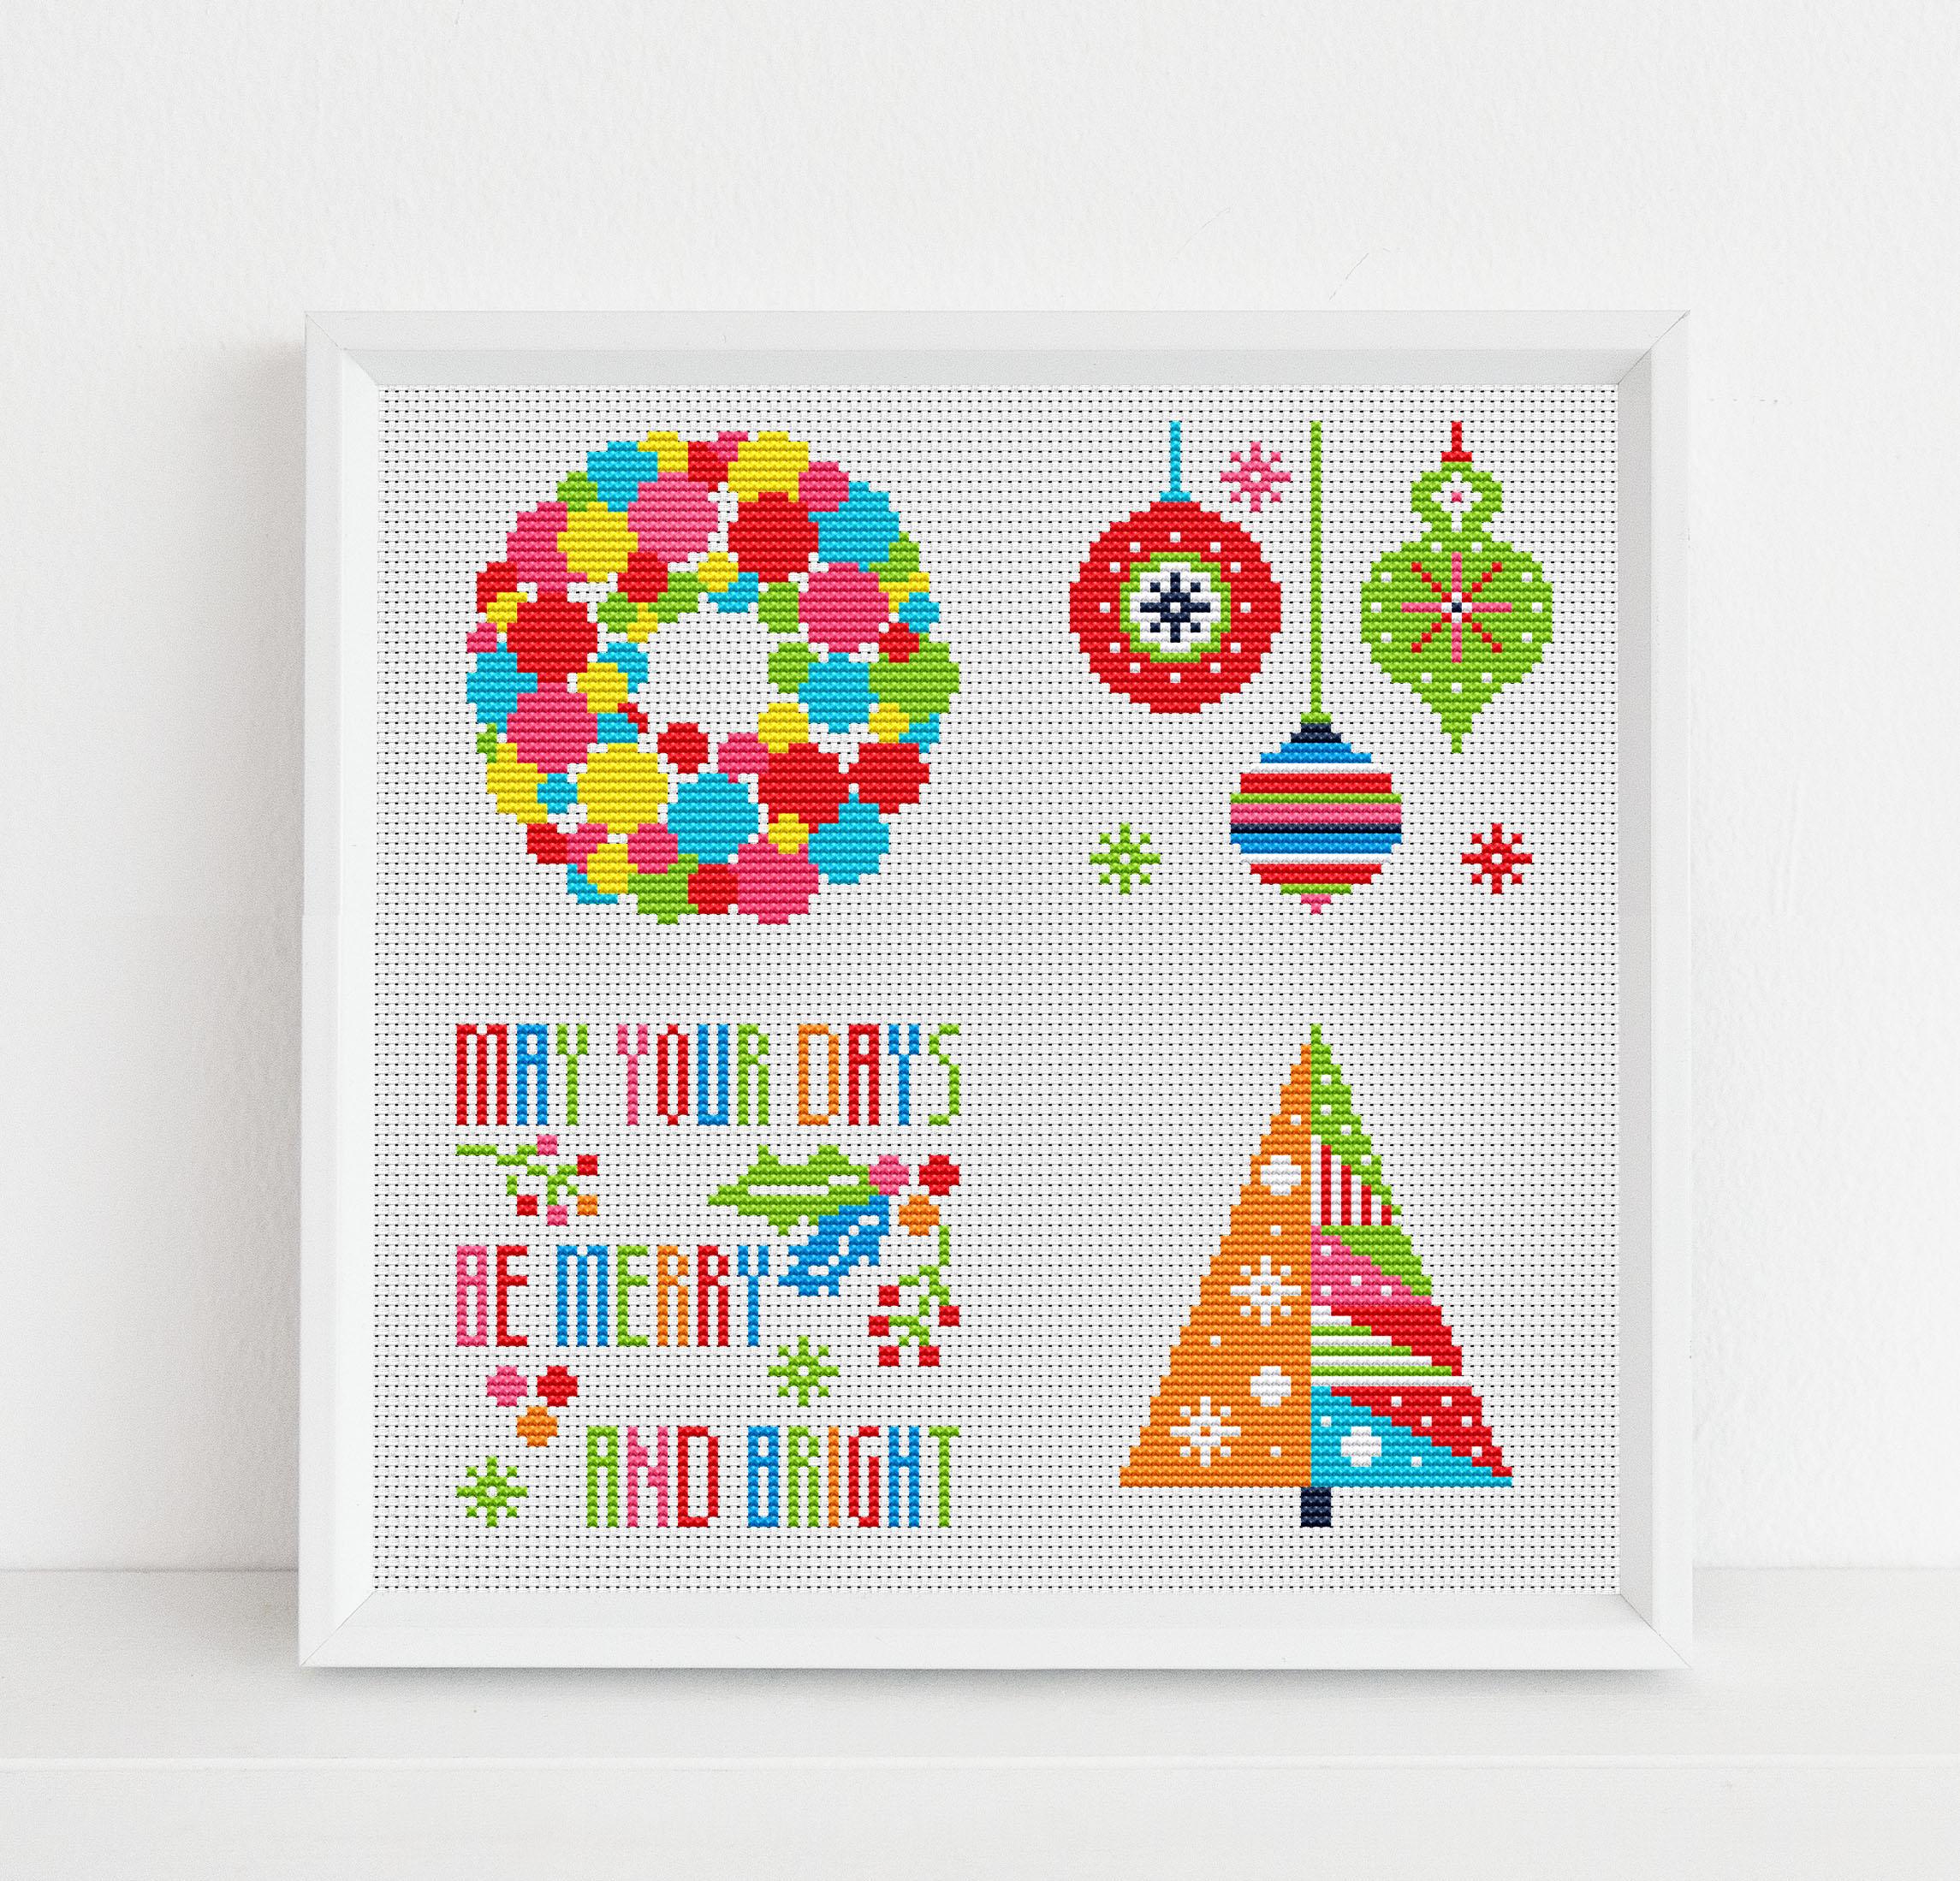 Christmas Card Design.Merry Bright Christmas Card Designs Cross Stitch Pattern